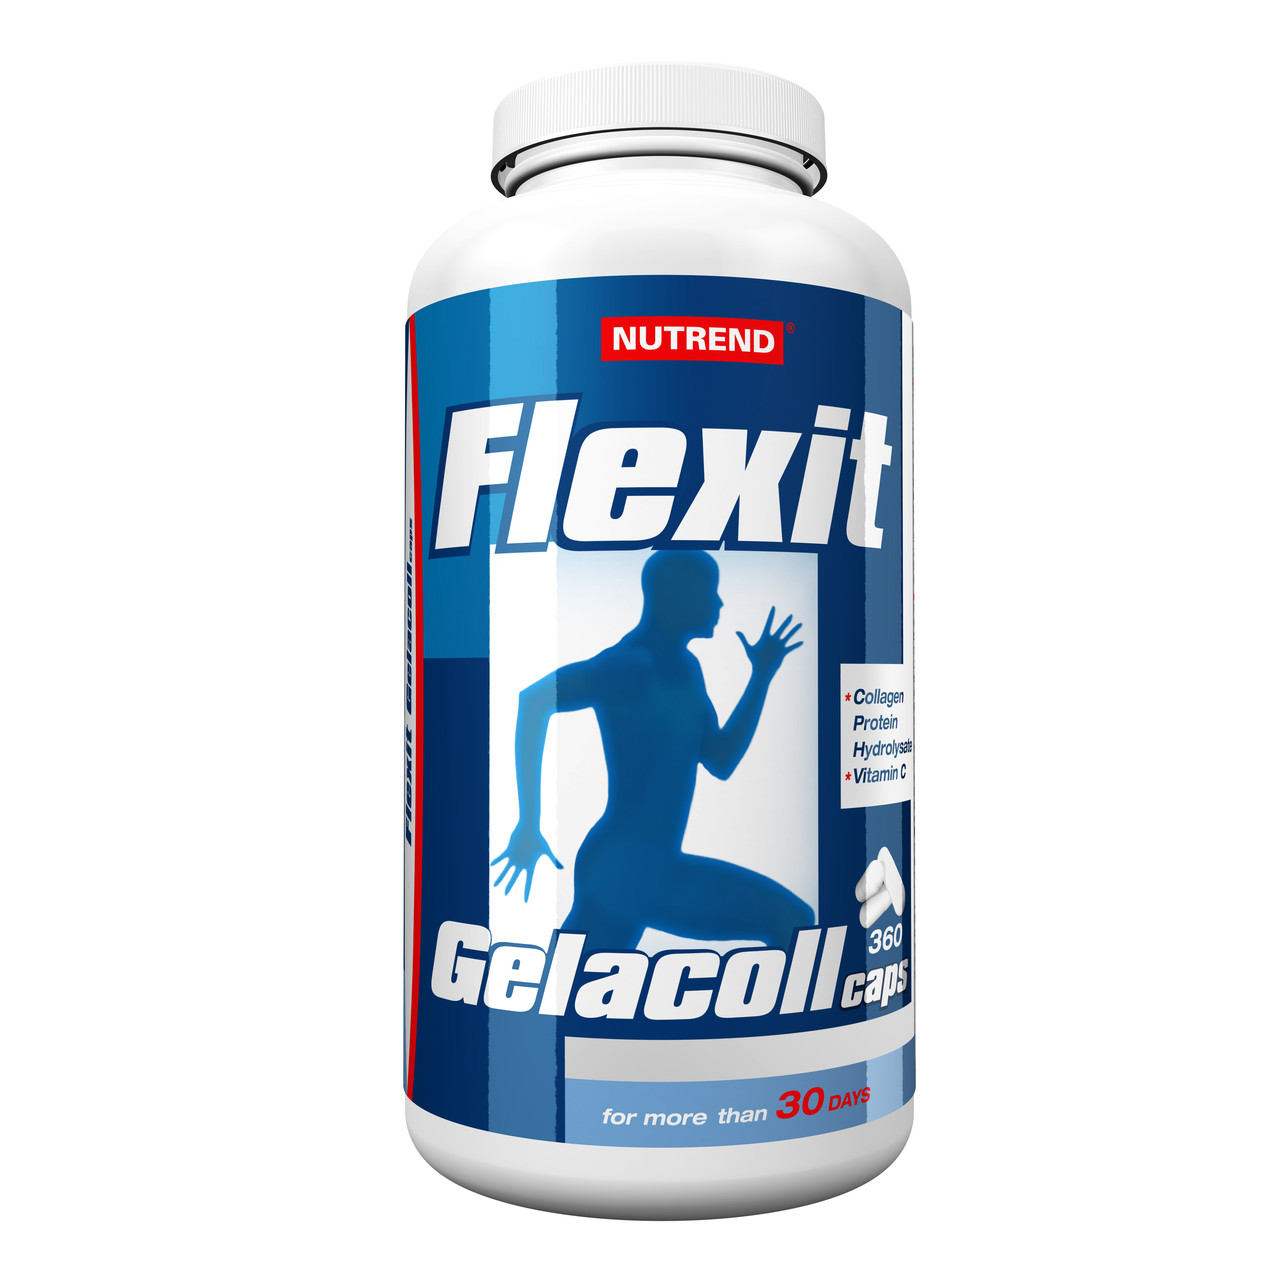 Nutrend Flexit Gelacoll 360 caps